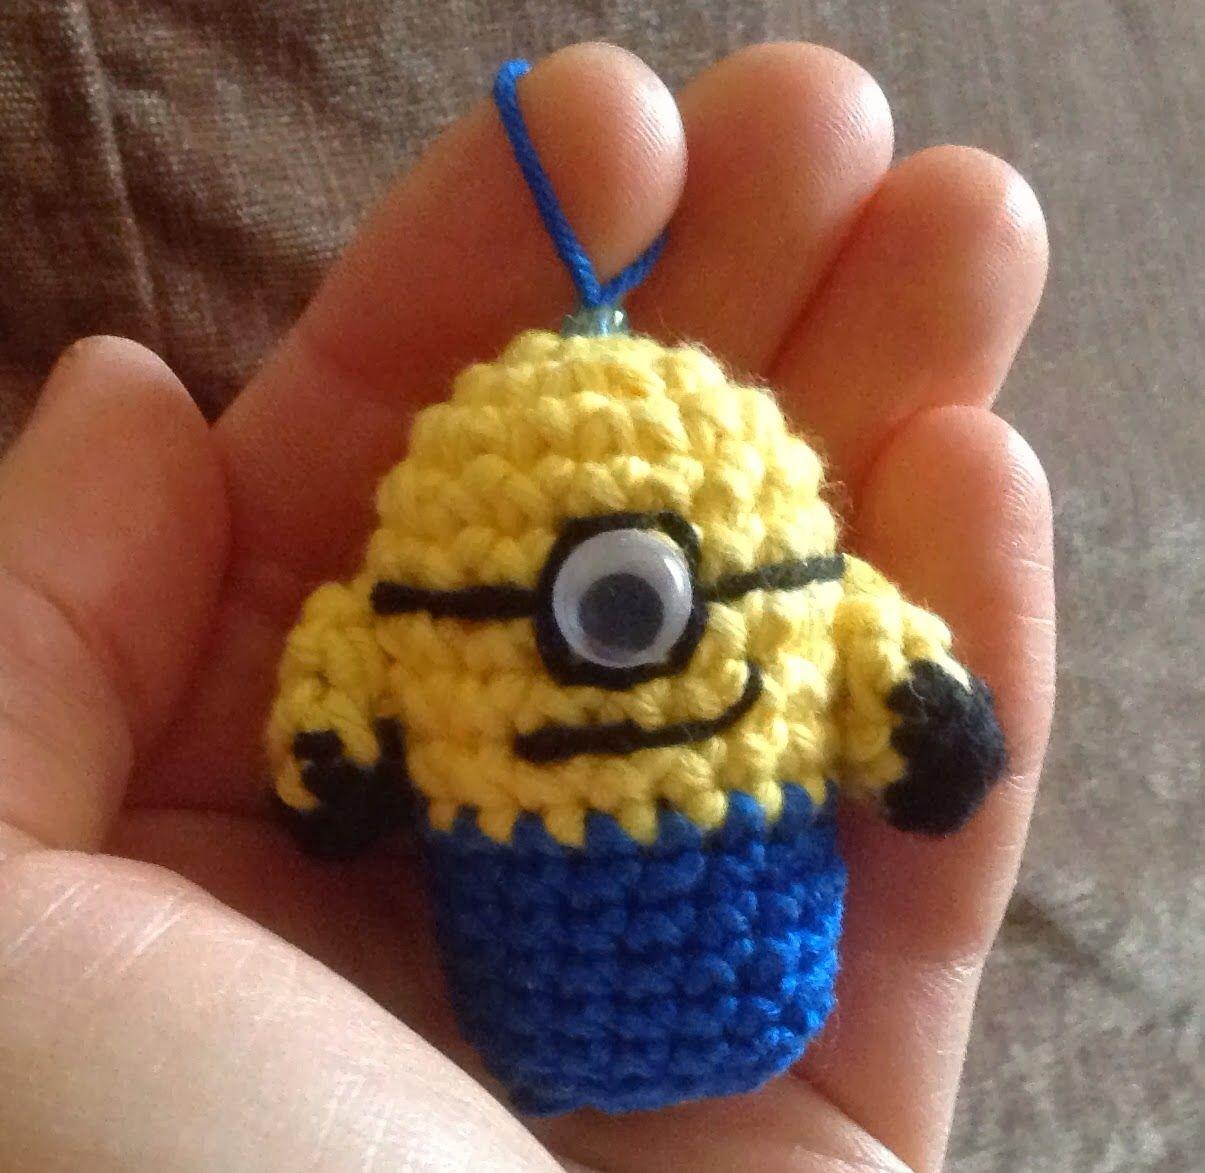 Annies Diy Minion Schlüsselanhänger Crochet Häkeln Häkelanleitung